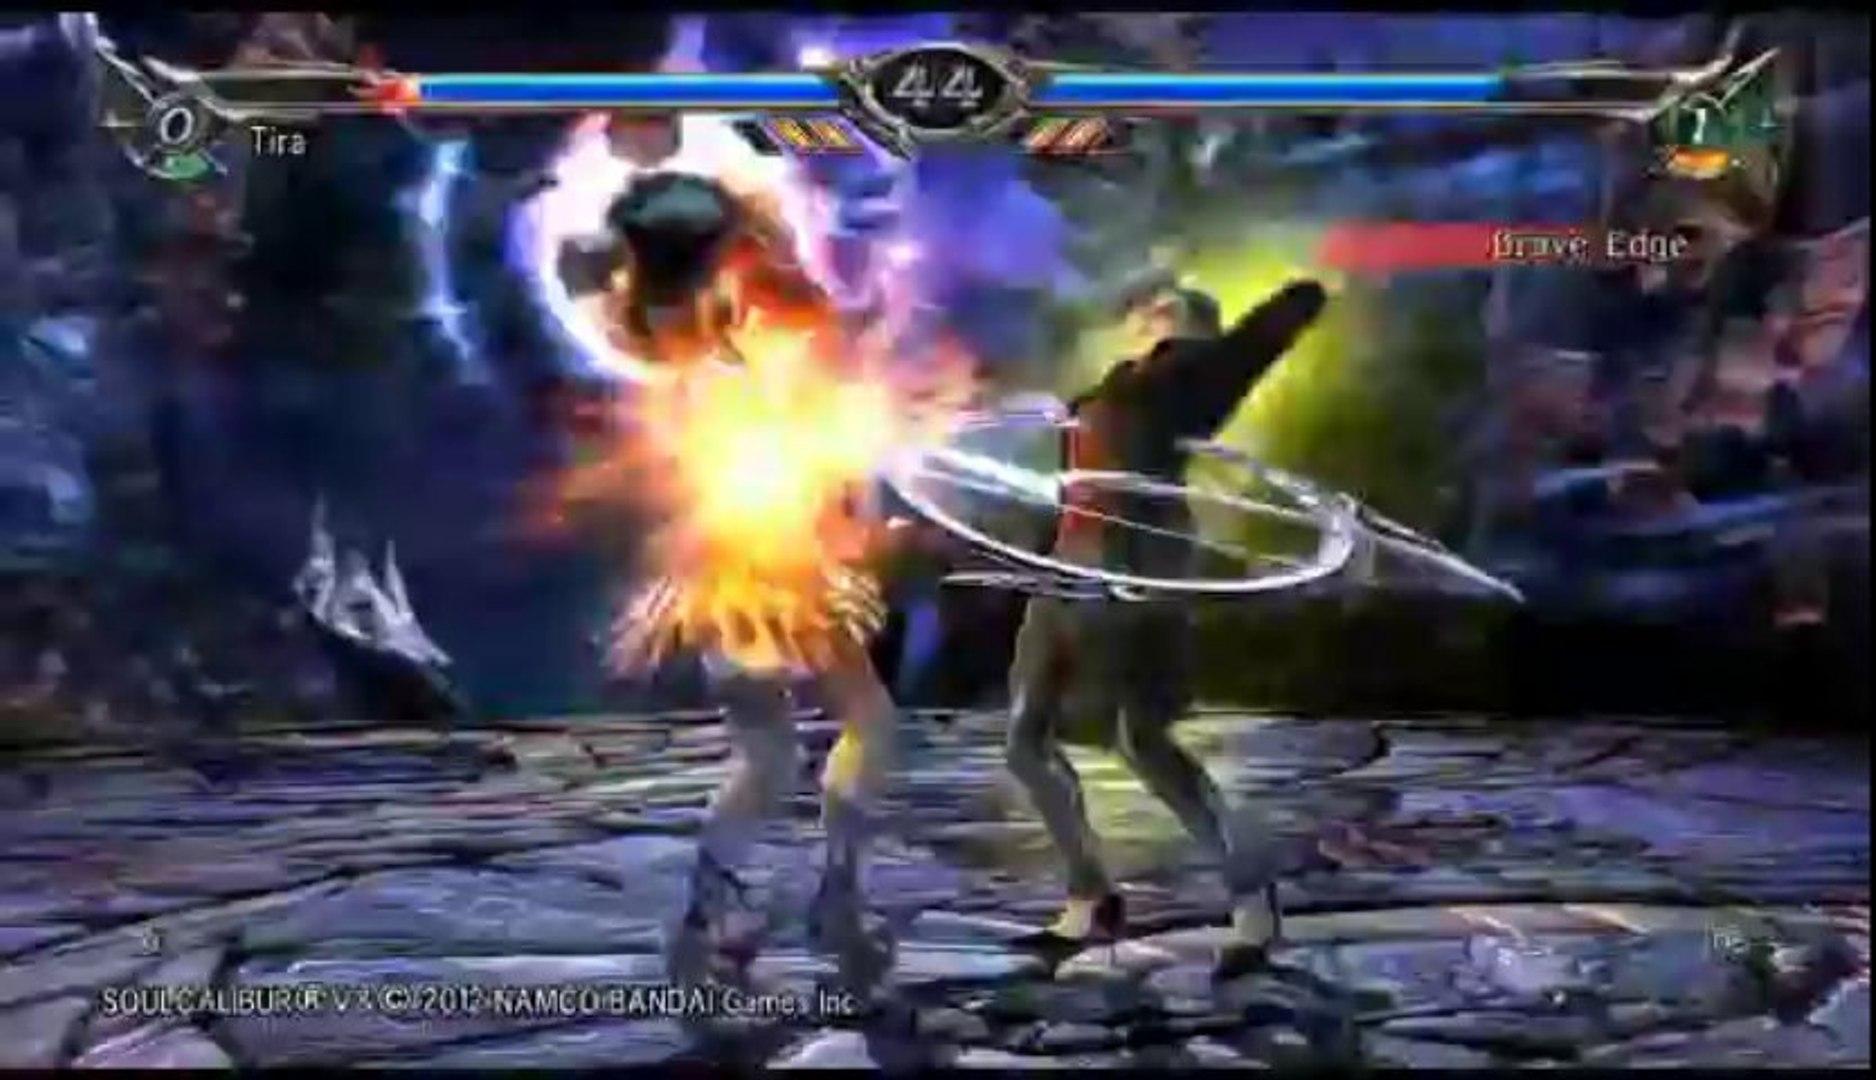 Soul Calibur V | Ranked Online Match - Tira Versus Tira